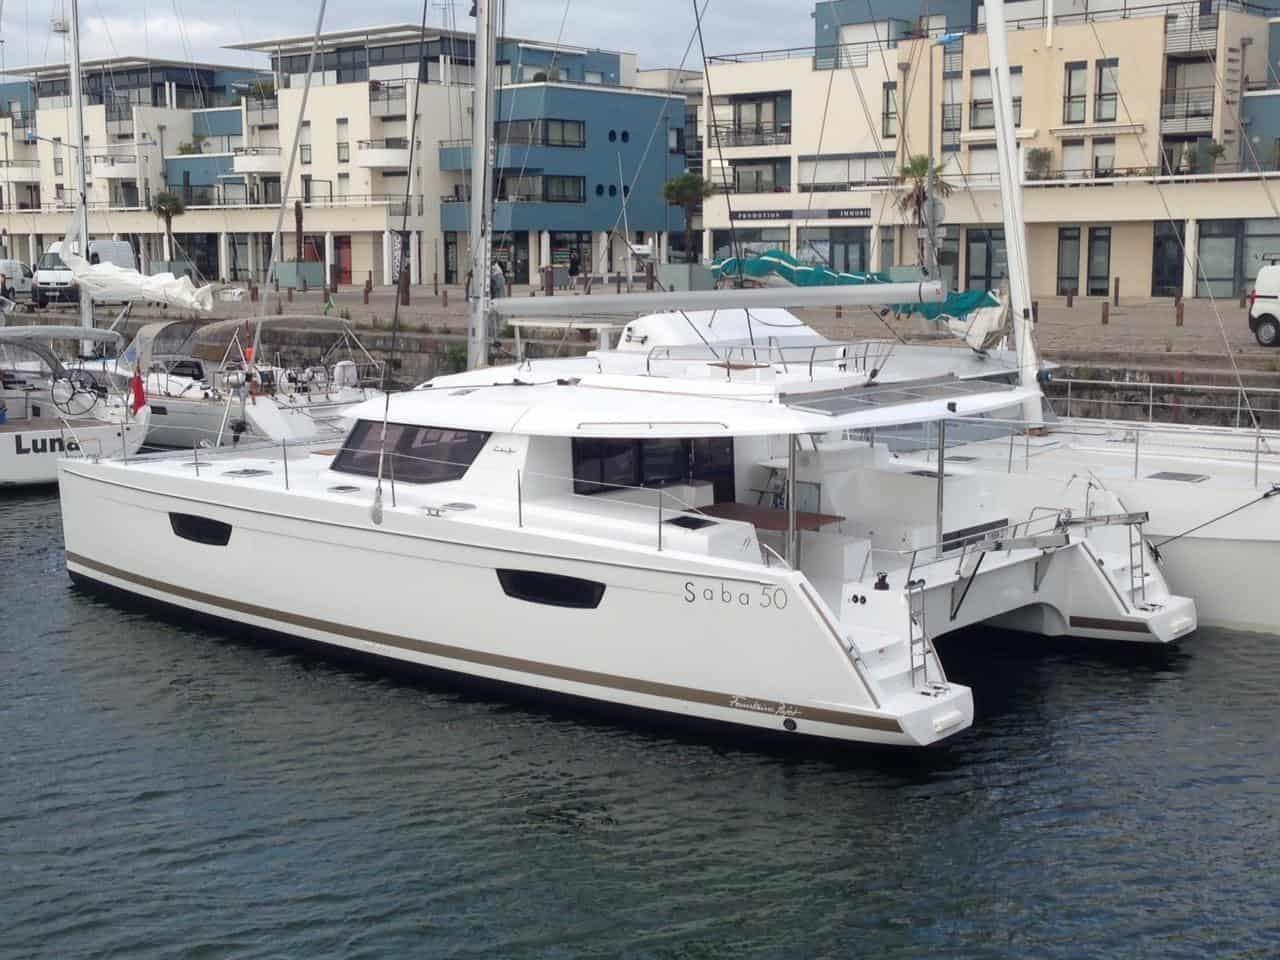 Saba 50 Catamaran by Fountaine Pajot